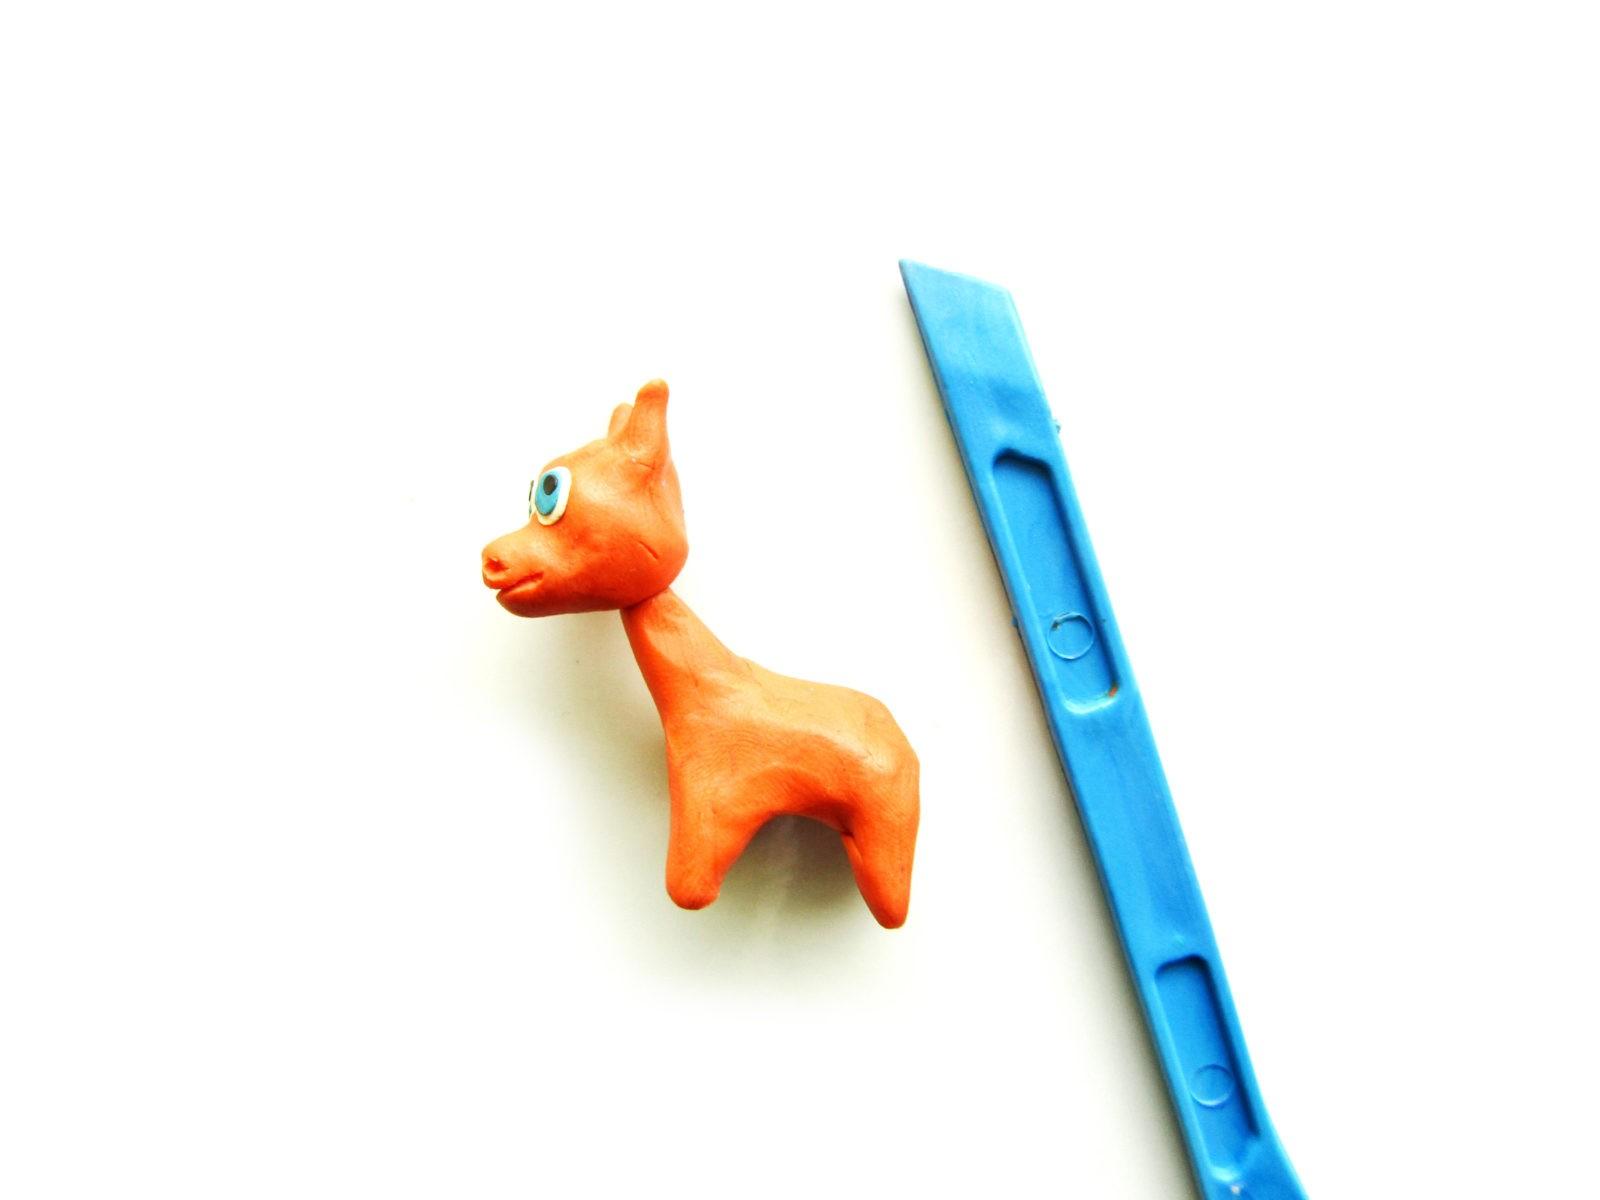 Как слепить жирафа из пластилина - 8